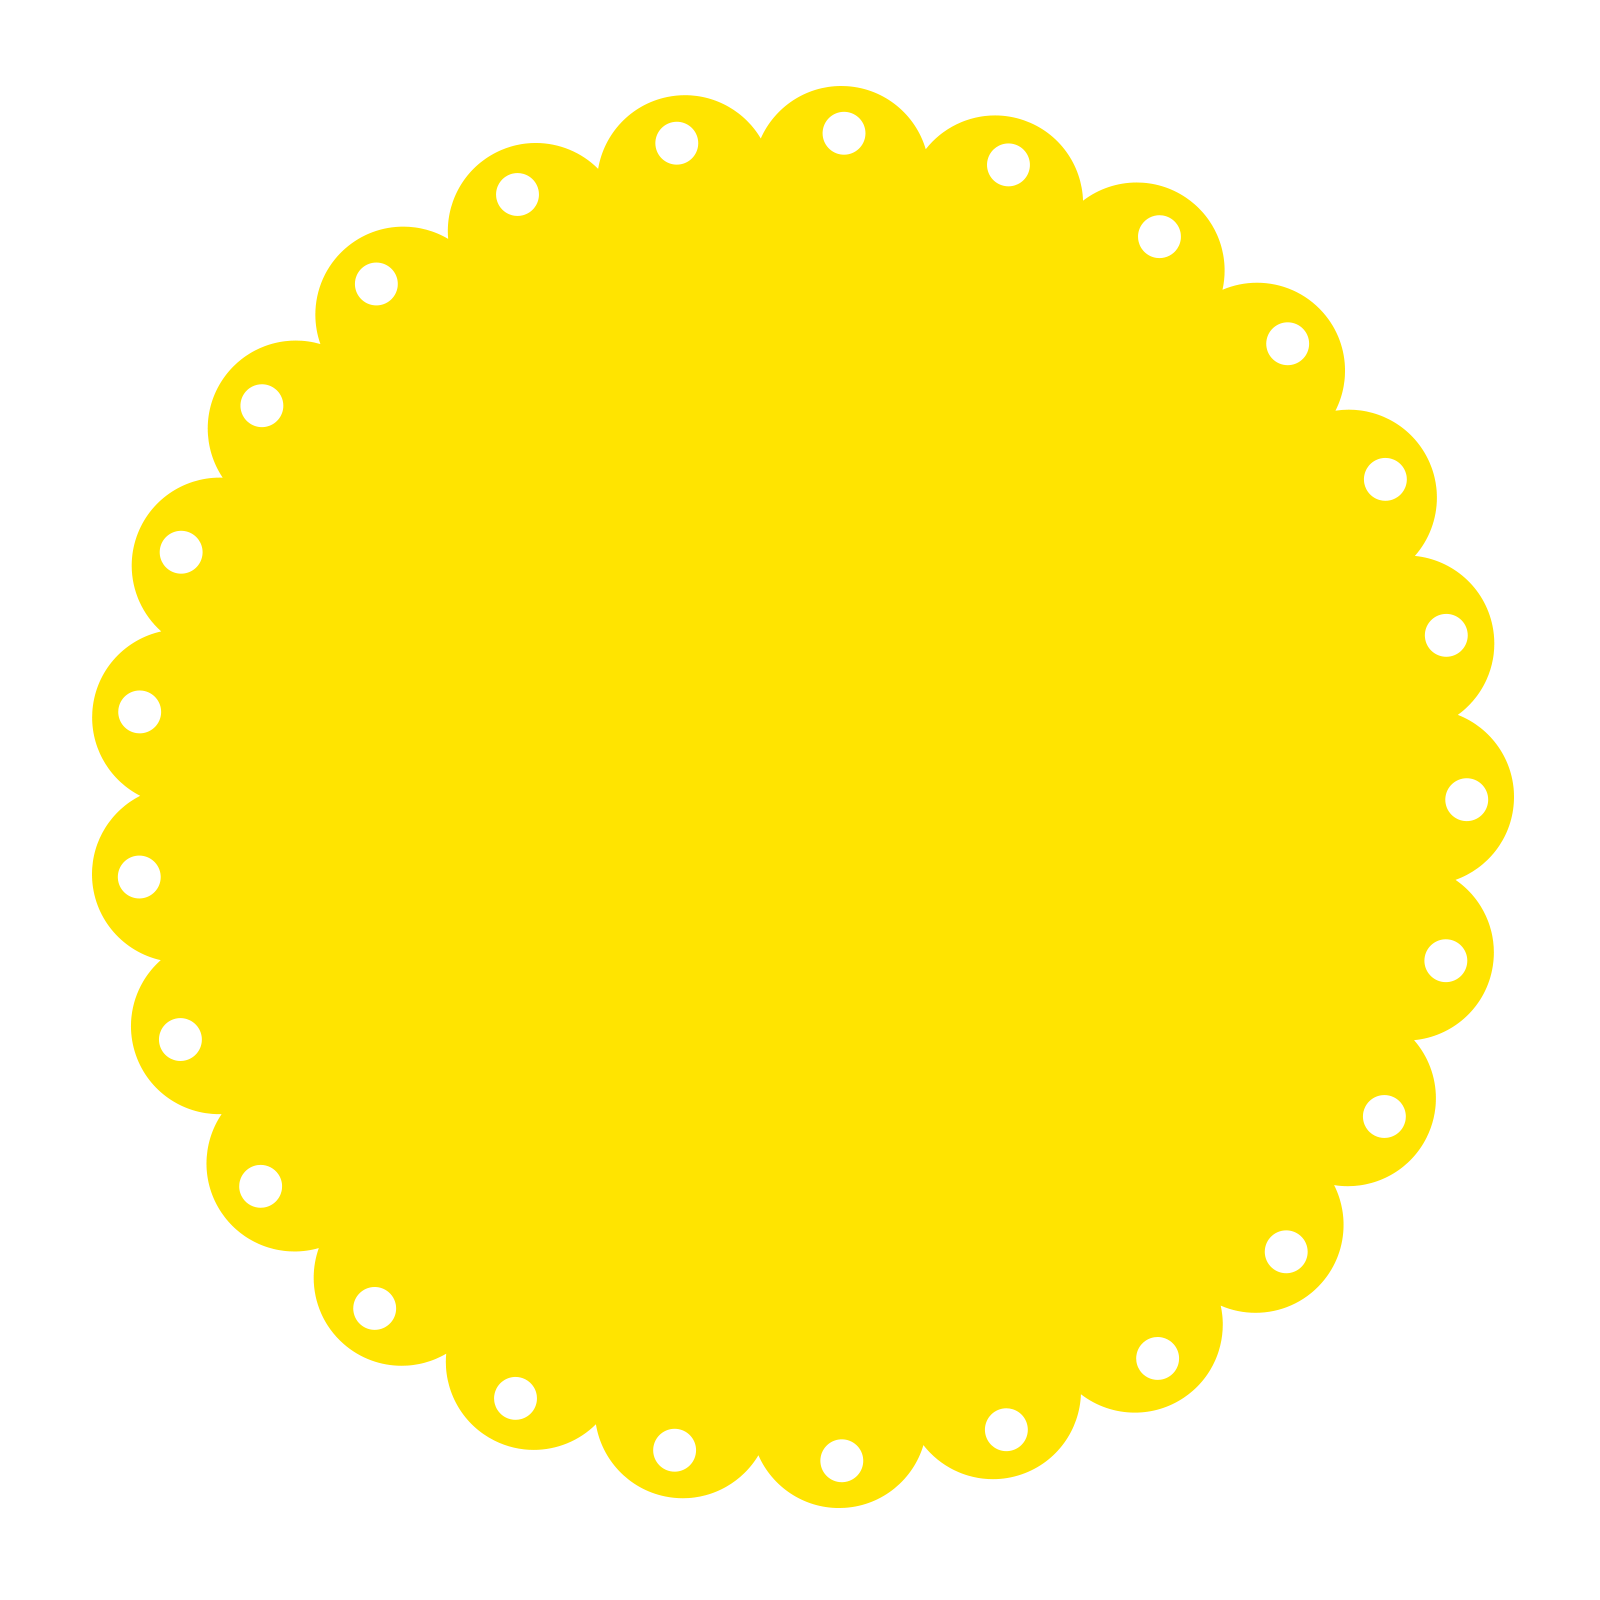 Bordes y marcos del. Scrapbook clipart circle